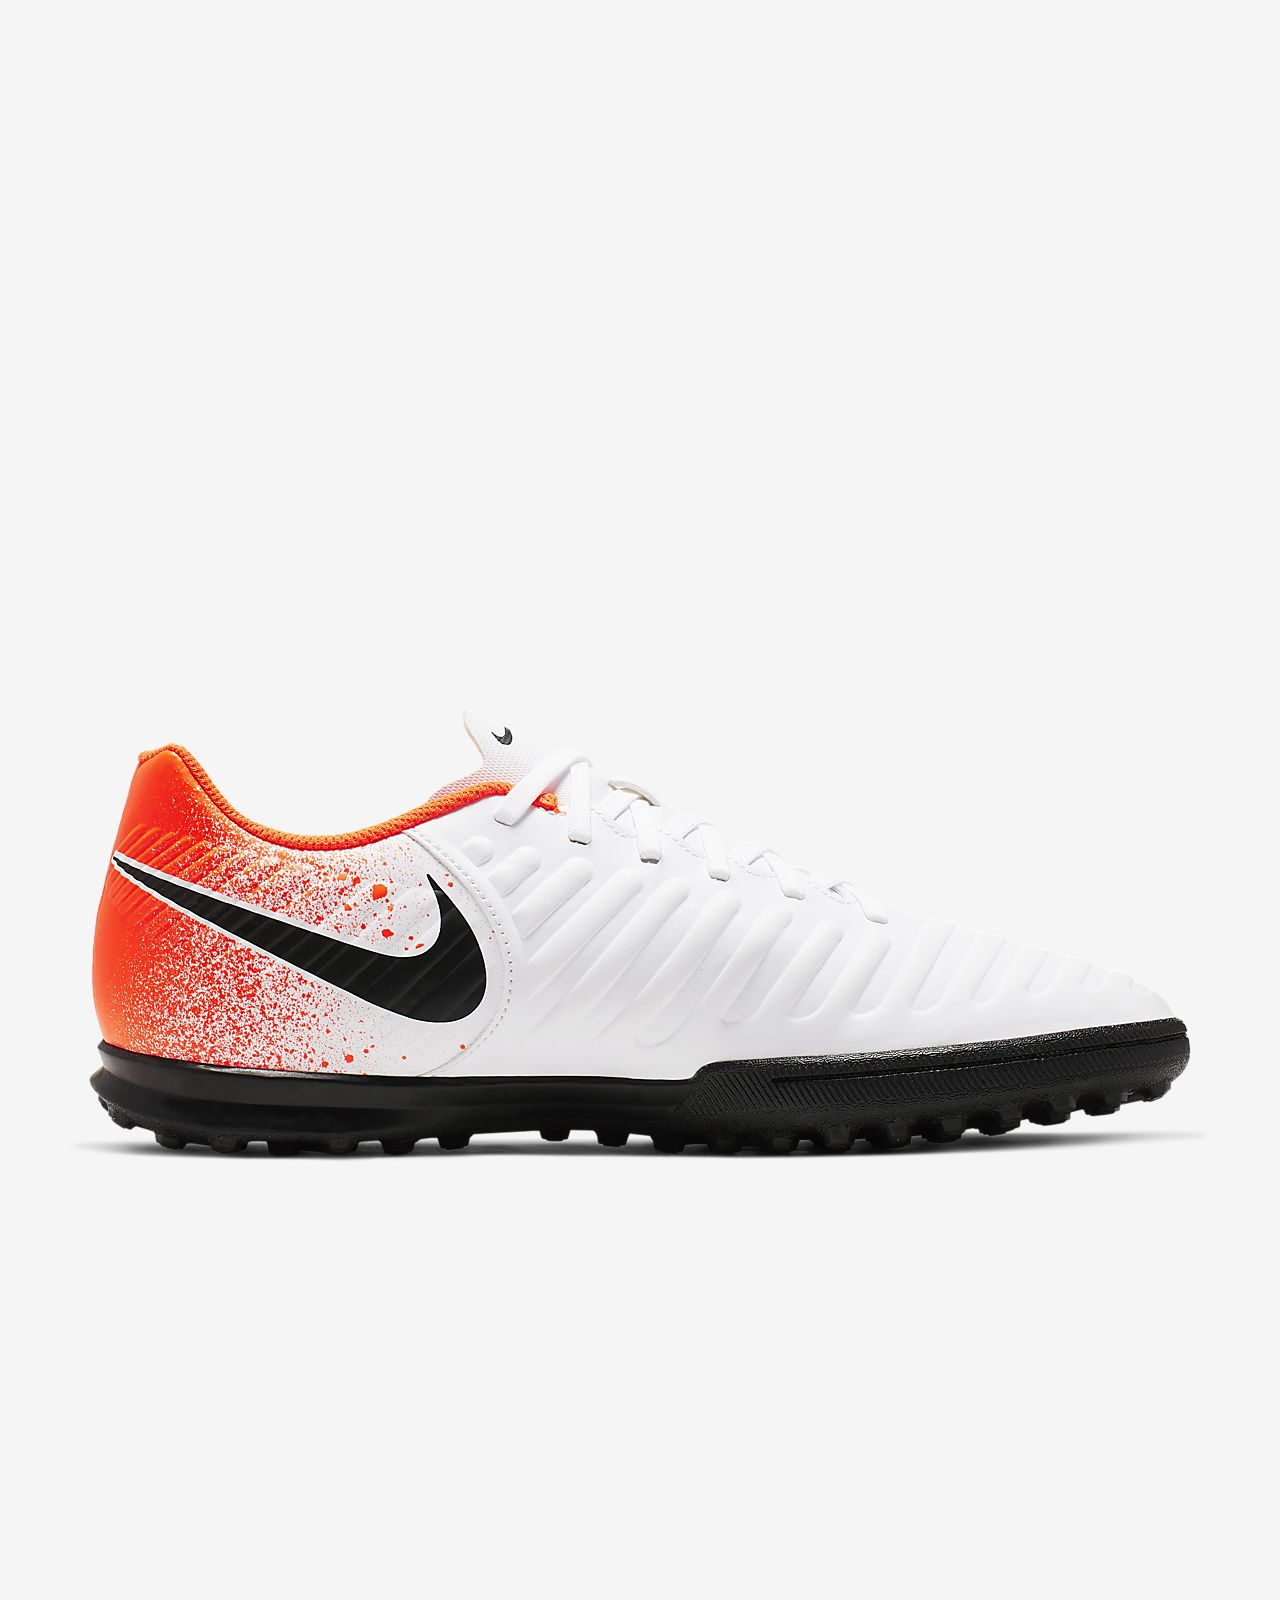 huge discount cb617 e32c8 Nike LegendX 7 Club TF Turf Football Shoe